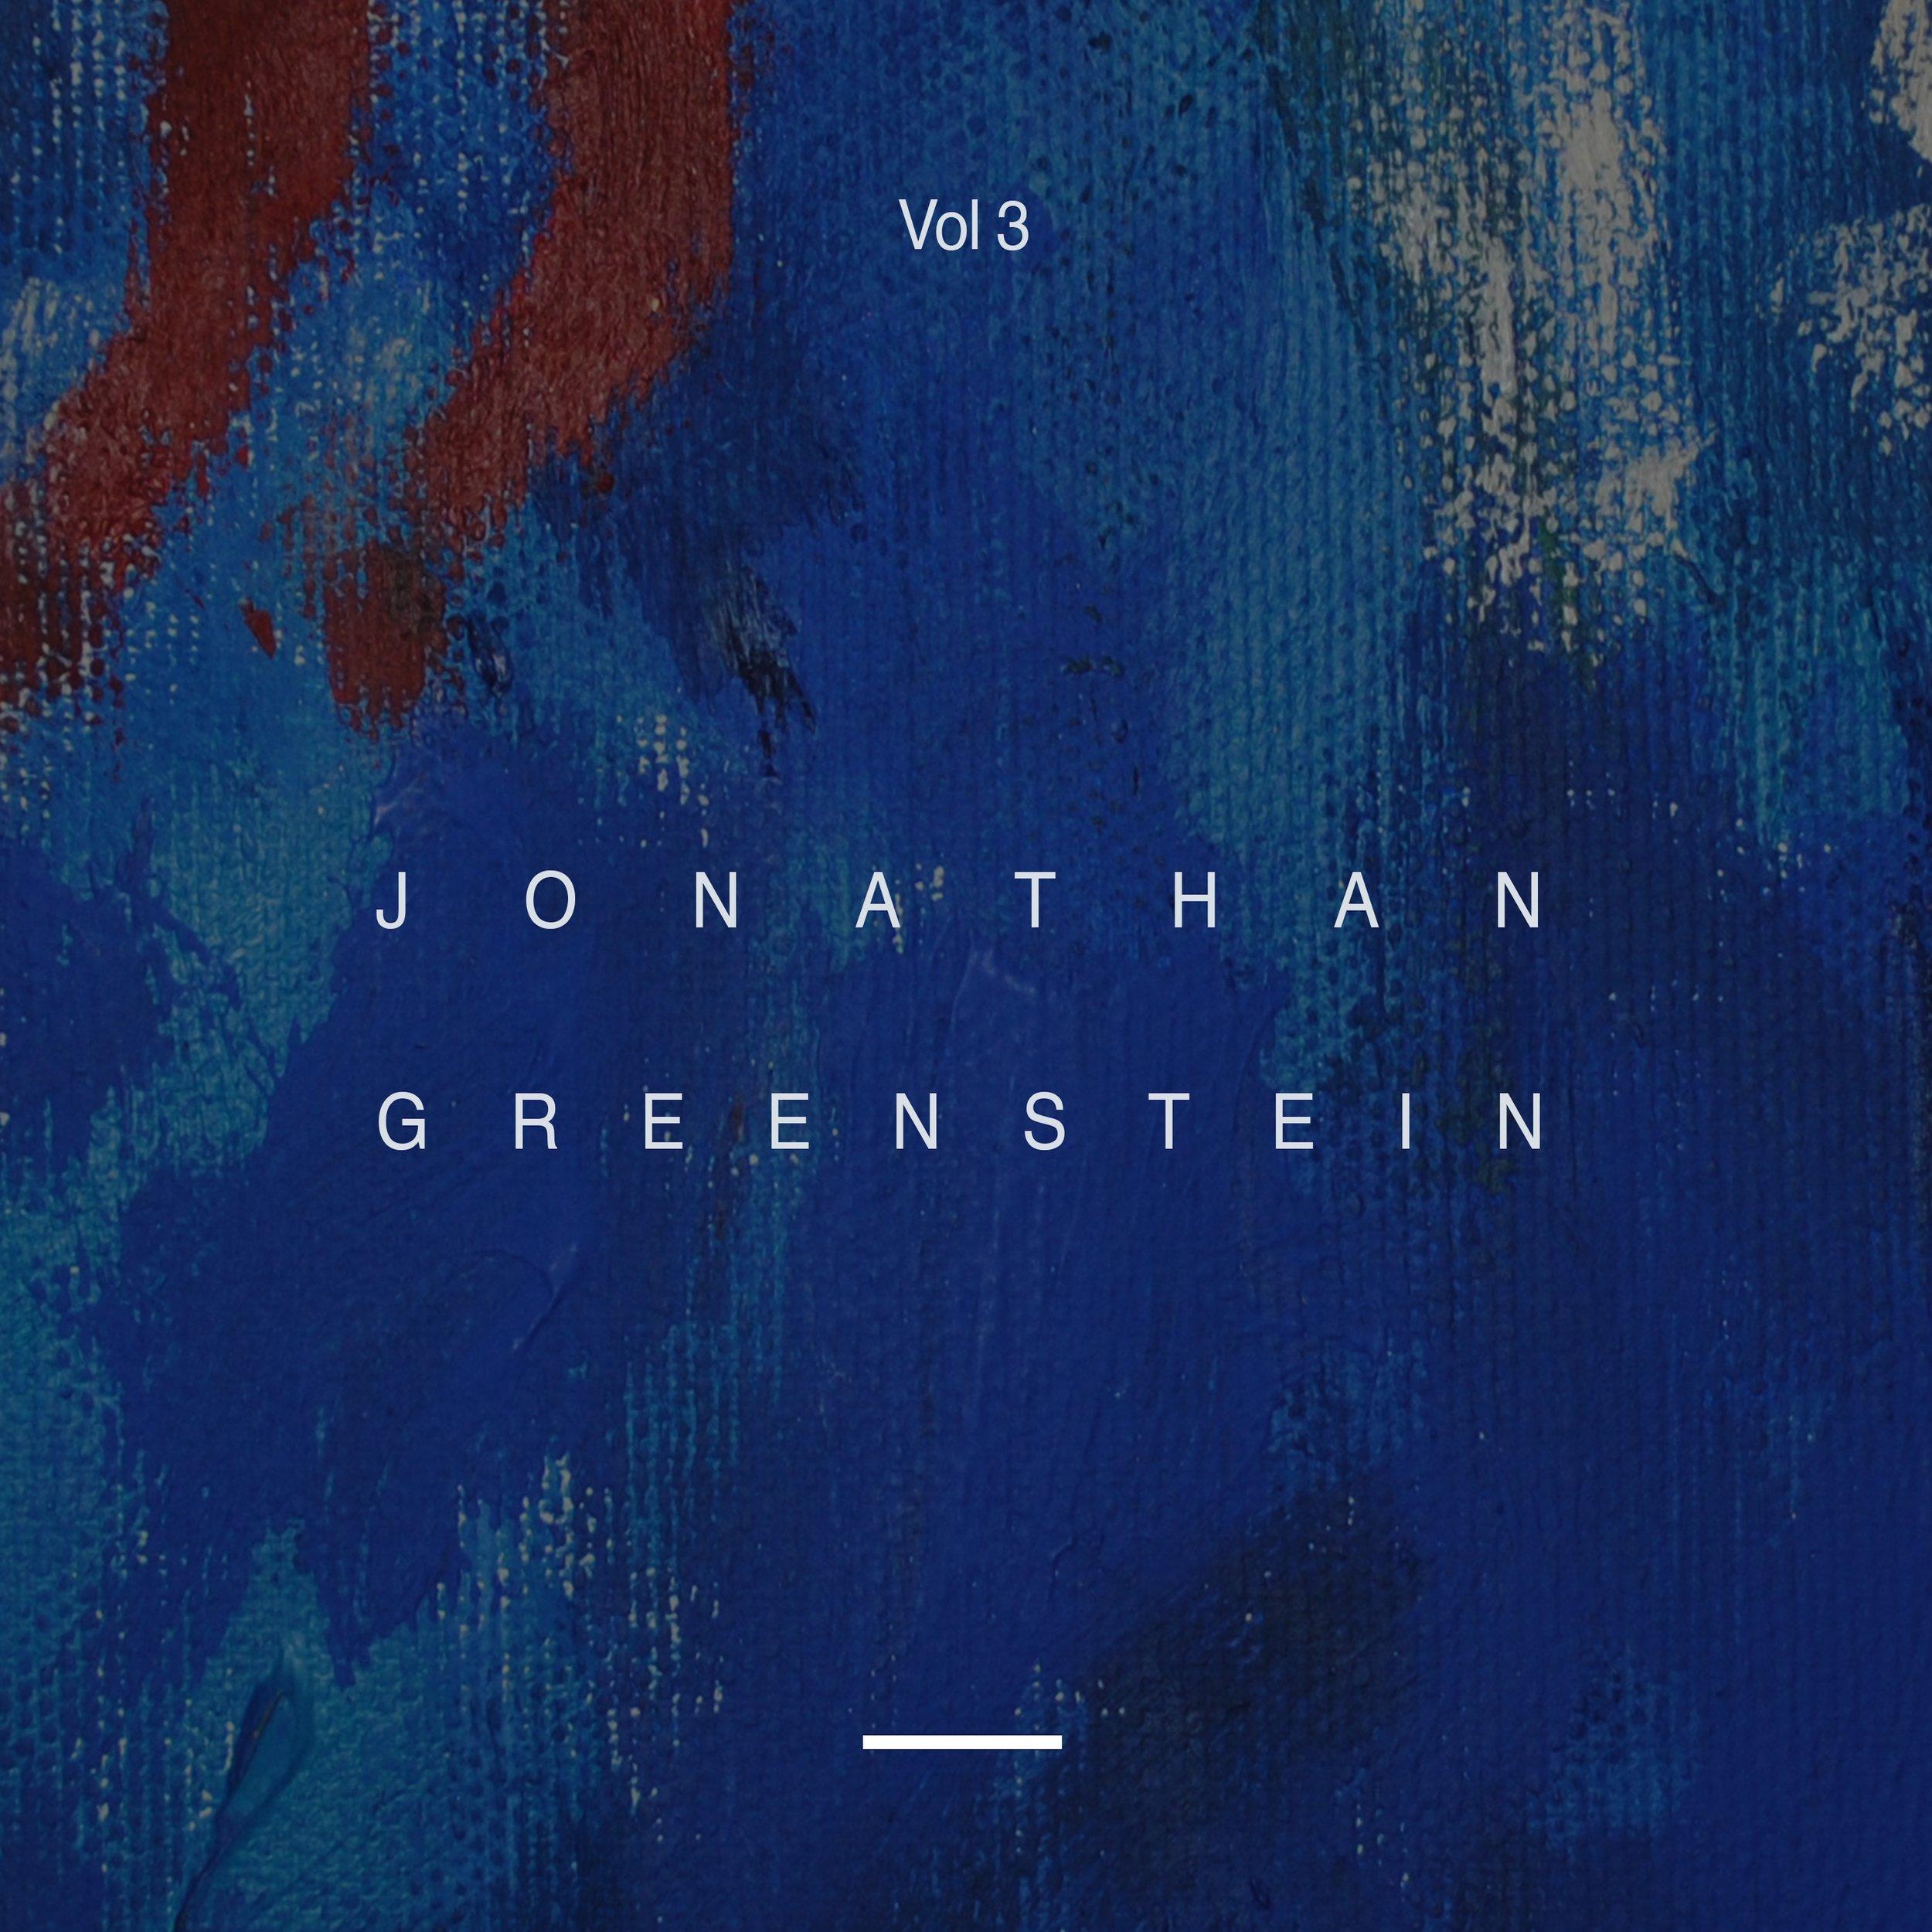 Jonathan Greenstein - Vol 3